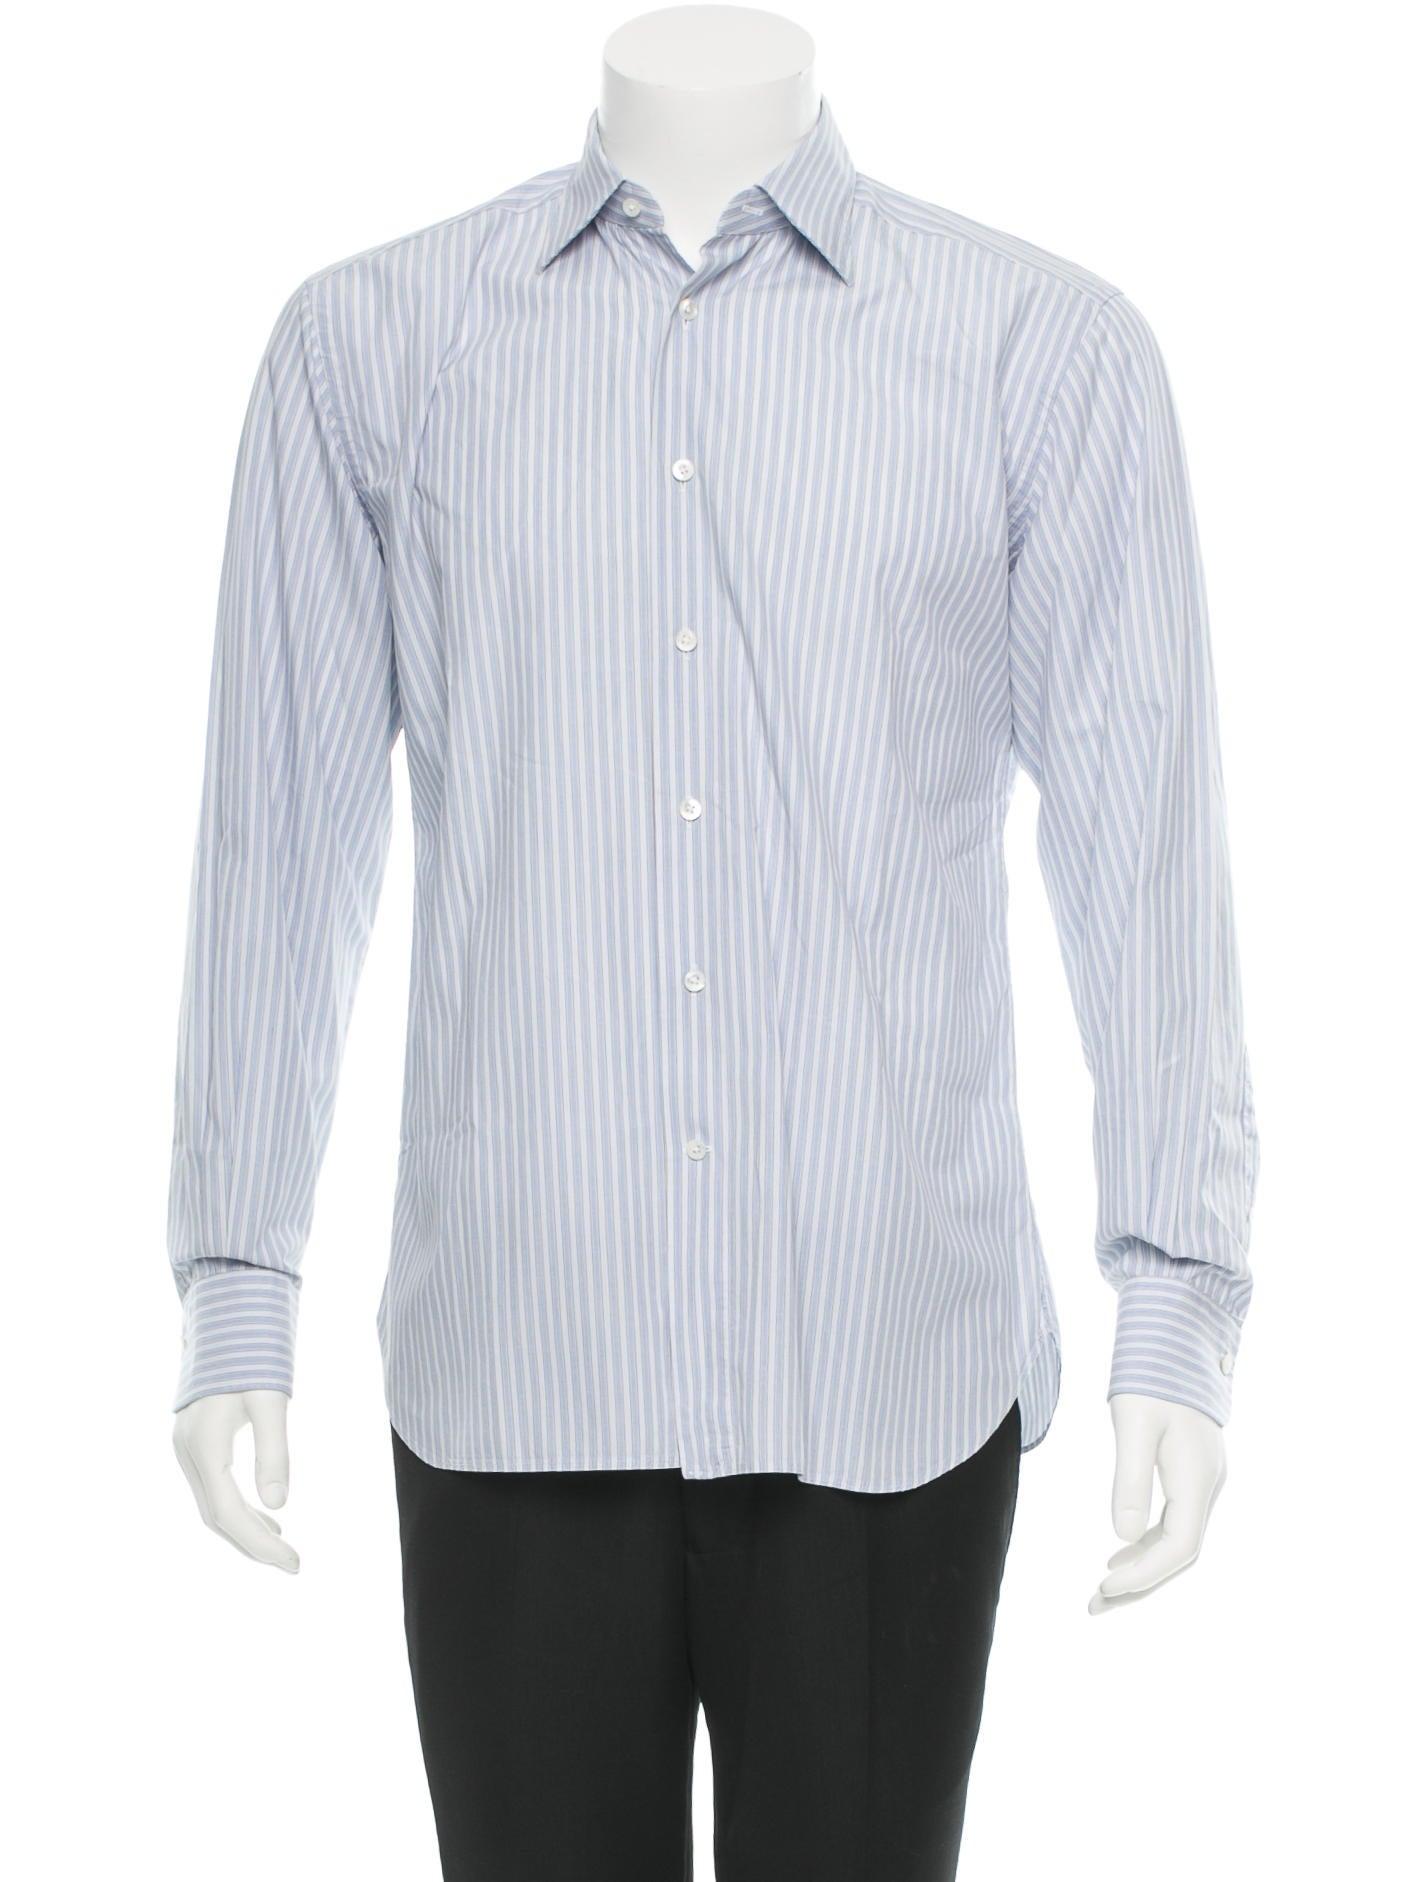 ermenegildo zegna shirt mens shirts zgn21060 the realreal. Black Bedroom Furniture Sets. Home Design Ideas